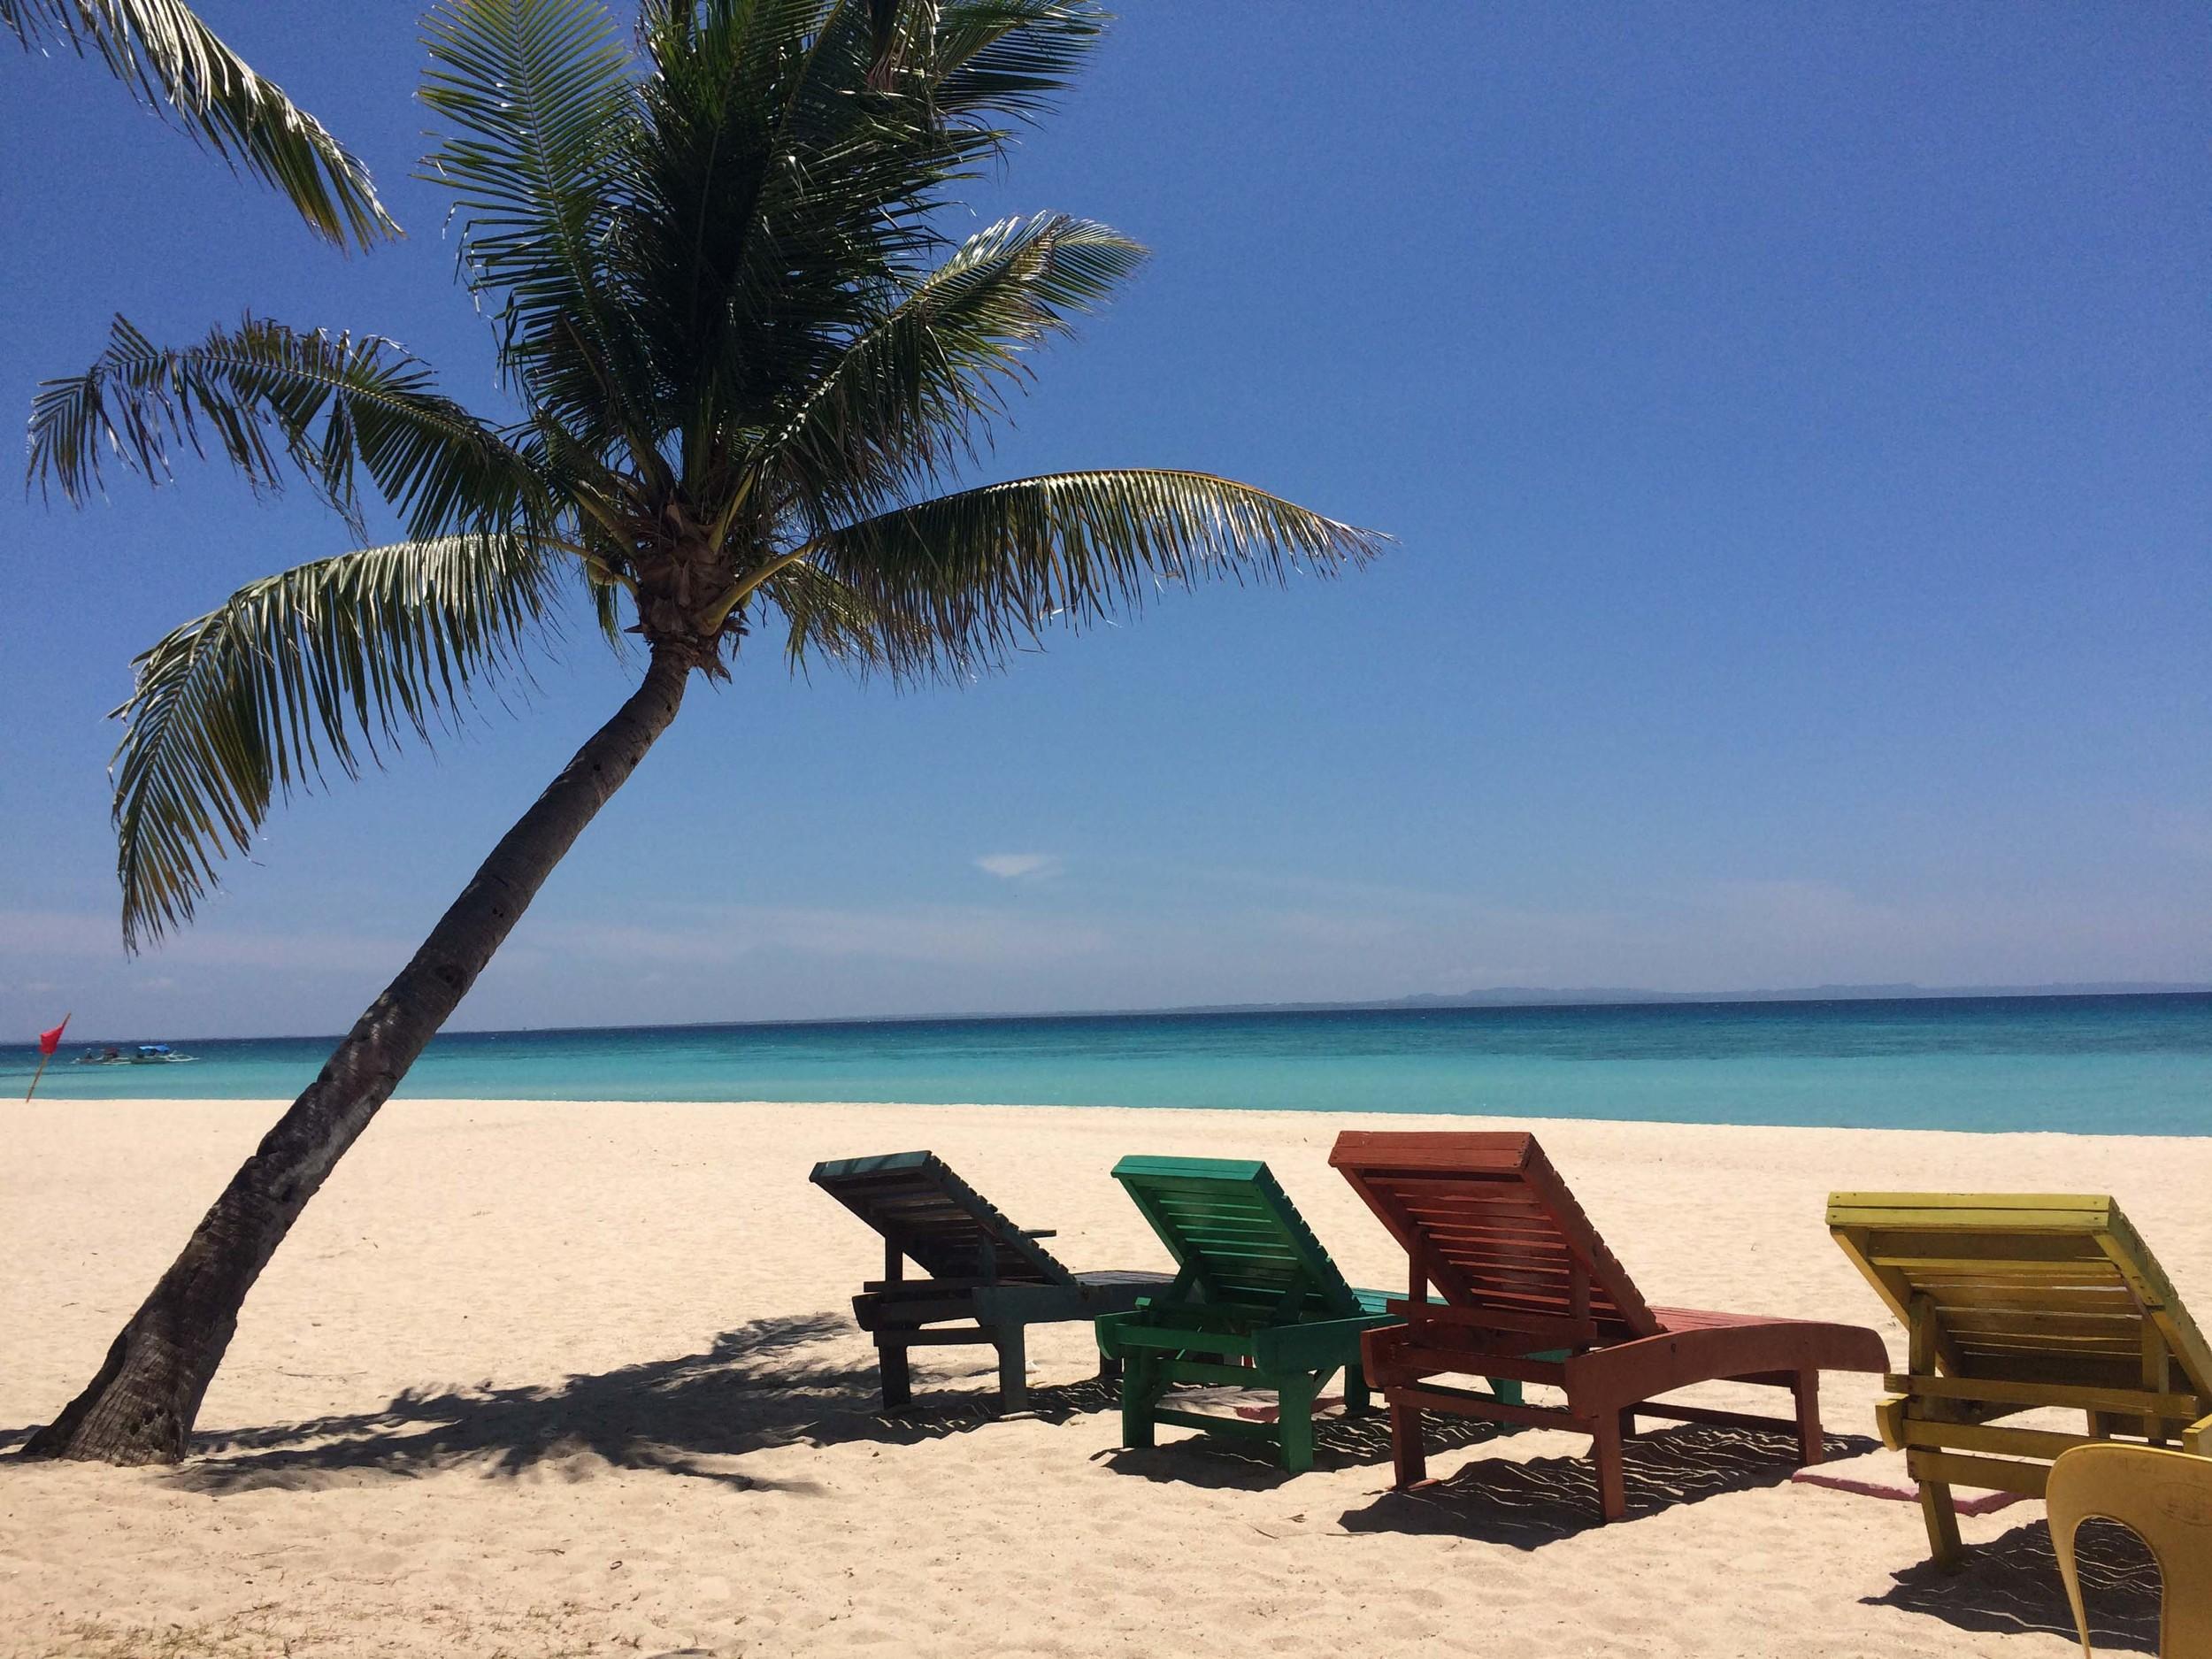 bantayan-island-philippines